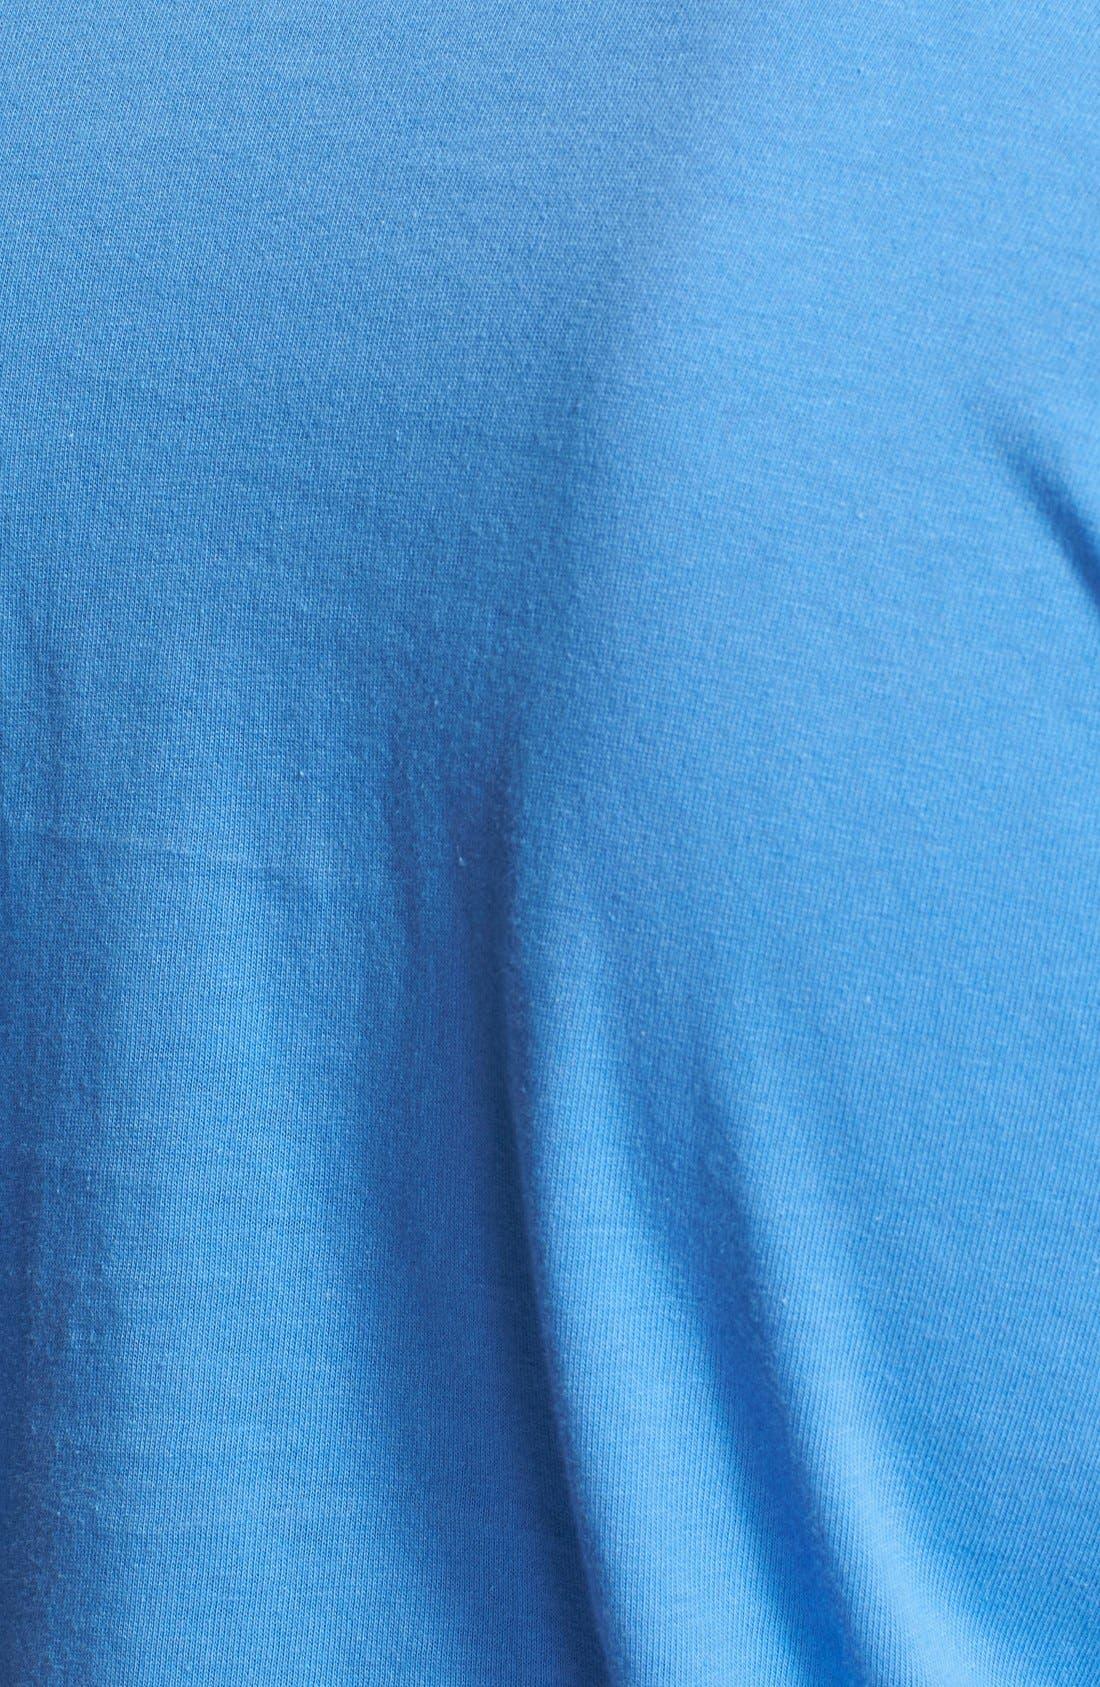 Alternate Image 3  - Comme des Garçons PLAY Cotton Jersey T-Shirt